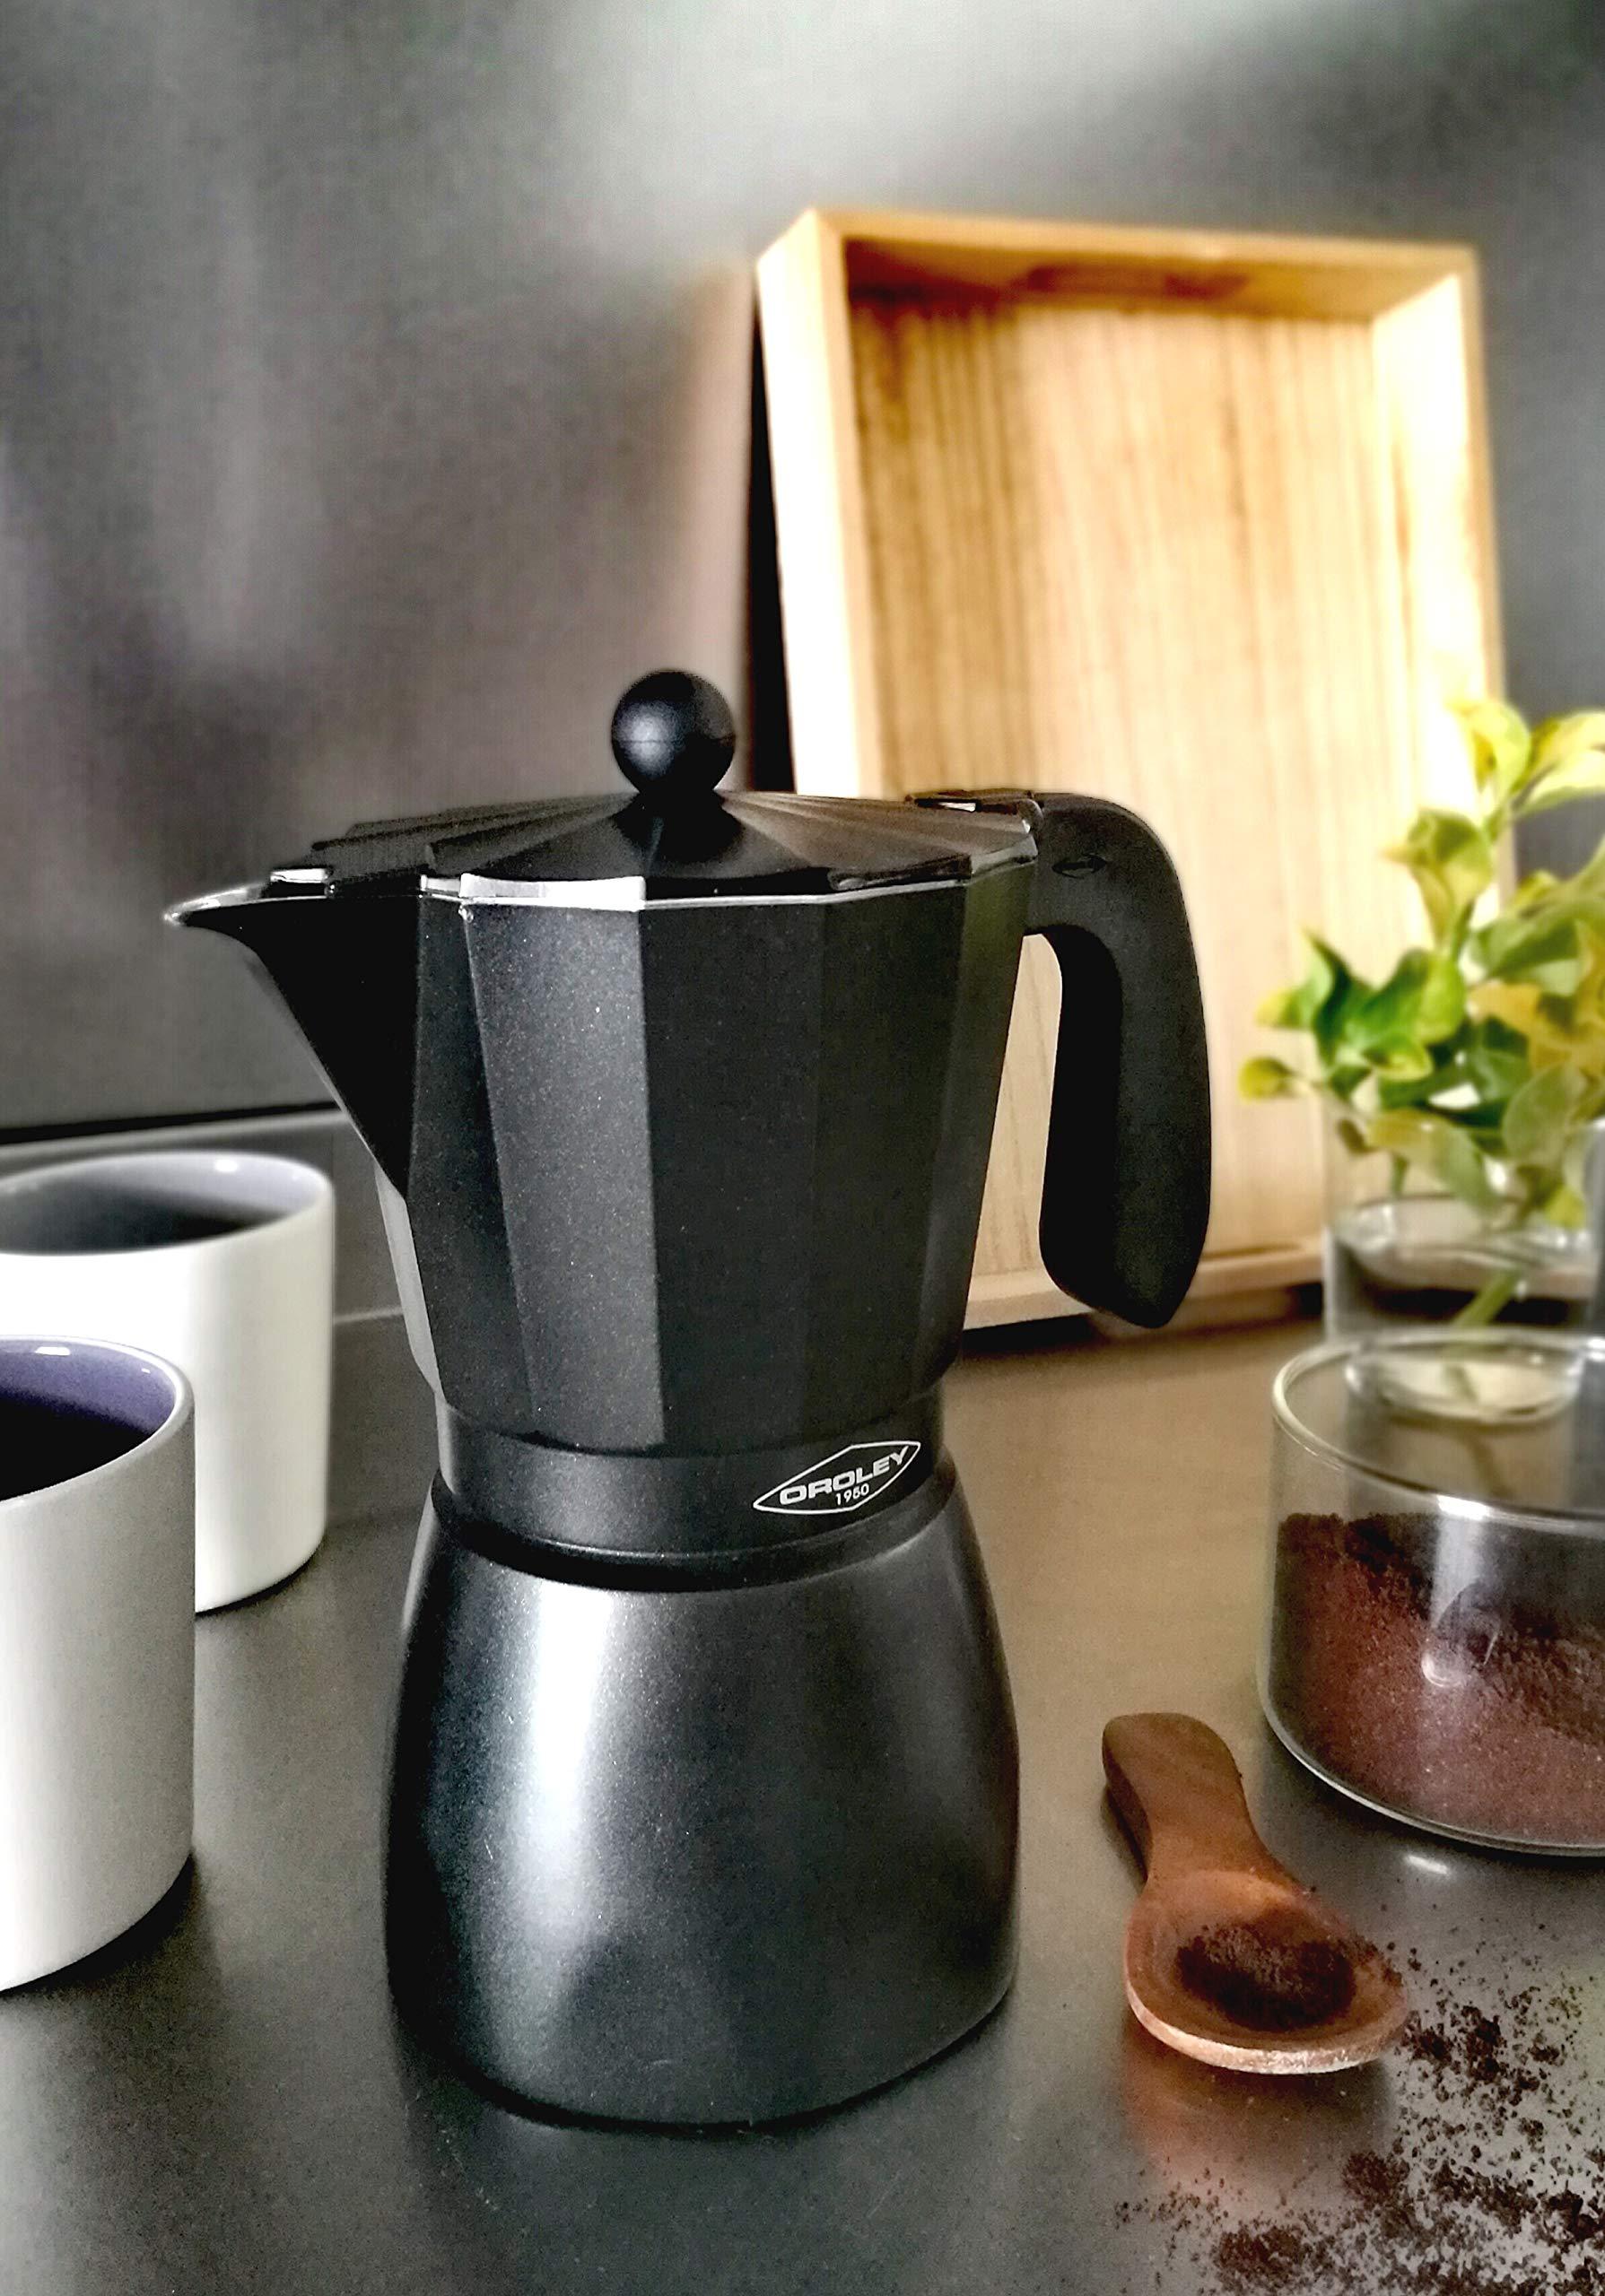 Oroley - Cafetera Italiana Touareg | Aluminio | 3 Tazas | Cafetera Vitrocerámica, Fuego y Gas | Estilo Tradicional ...